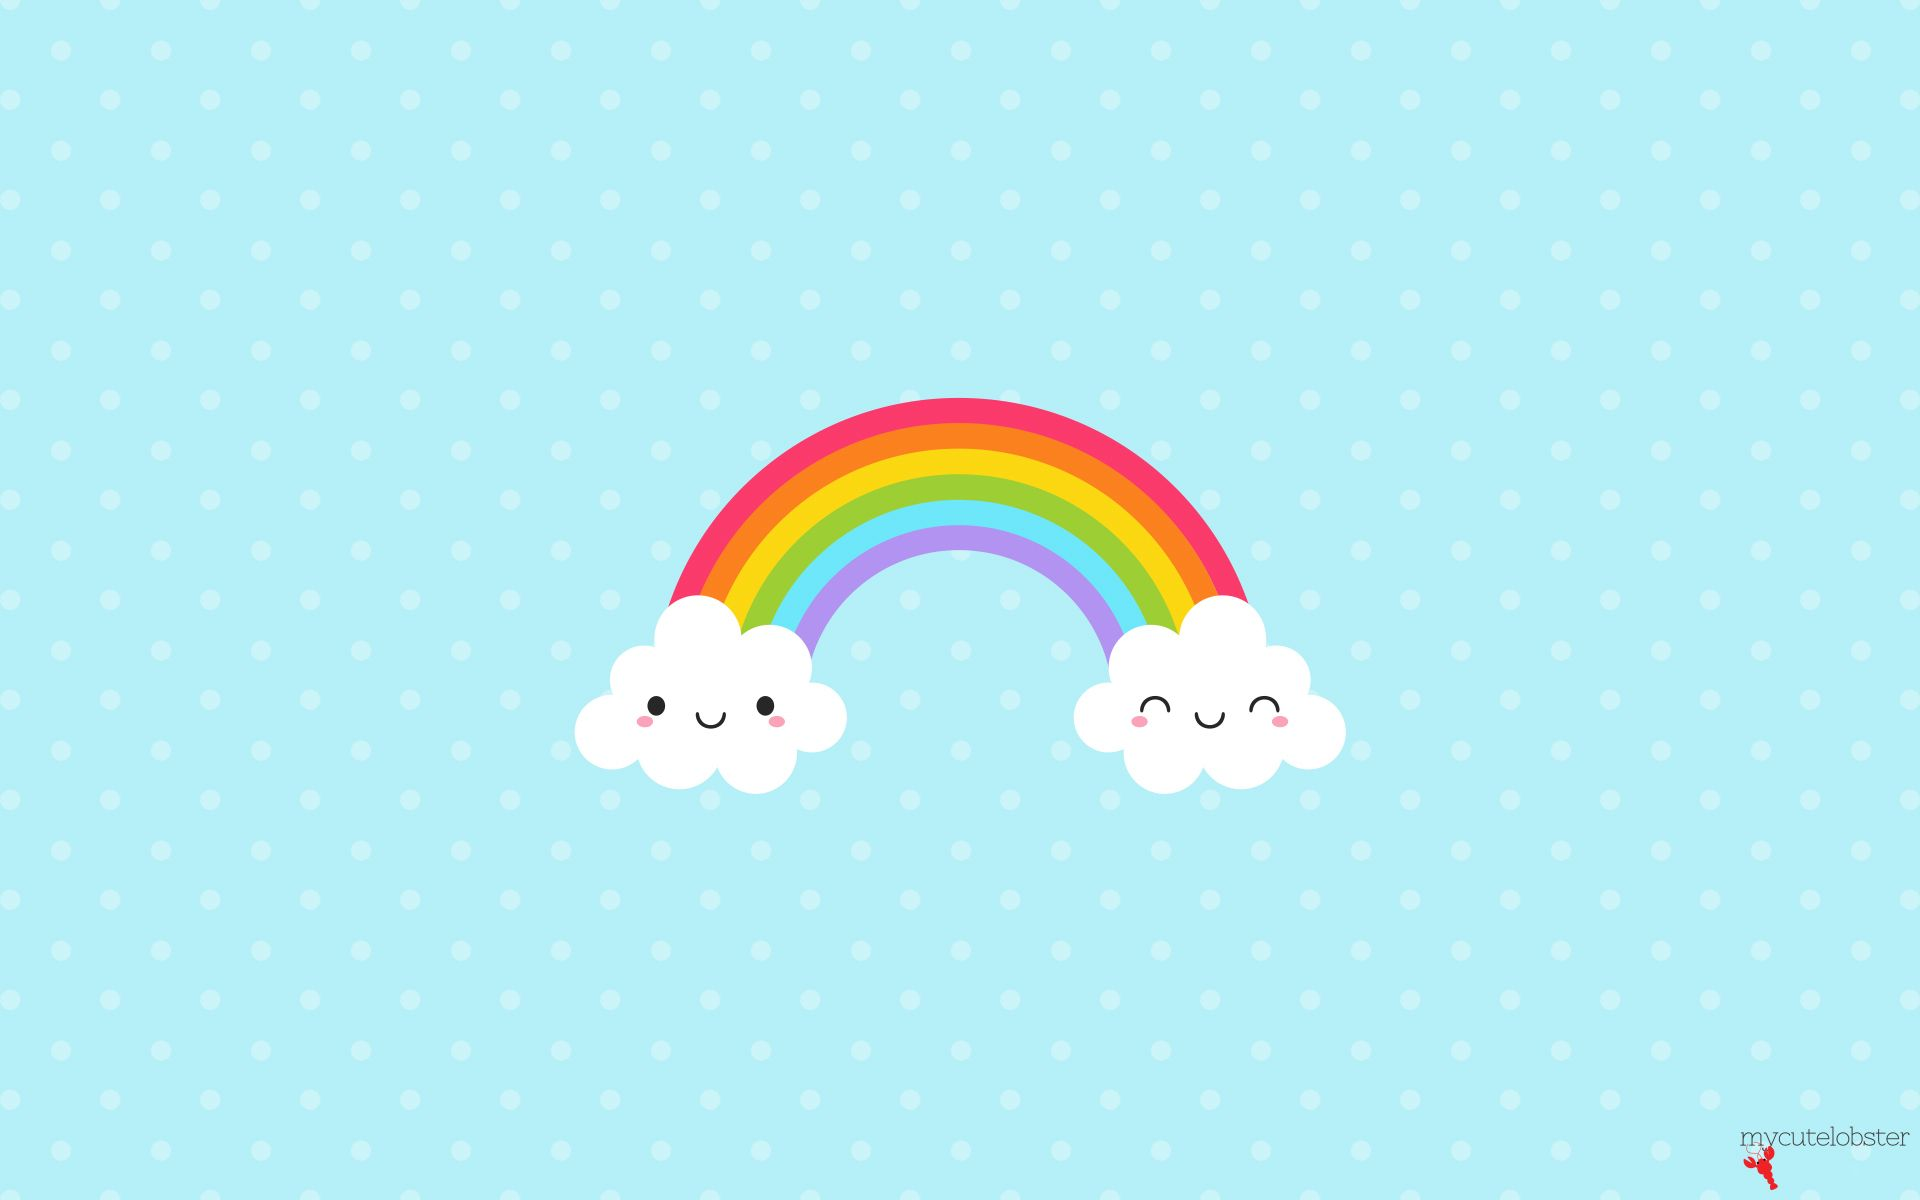 Cute Rainbow Wallpapers - Top Free Cute Rainbow ...